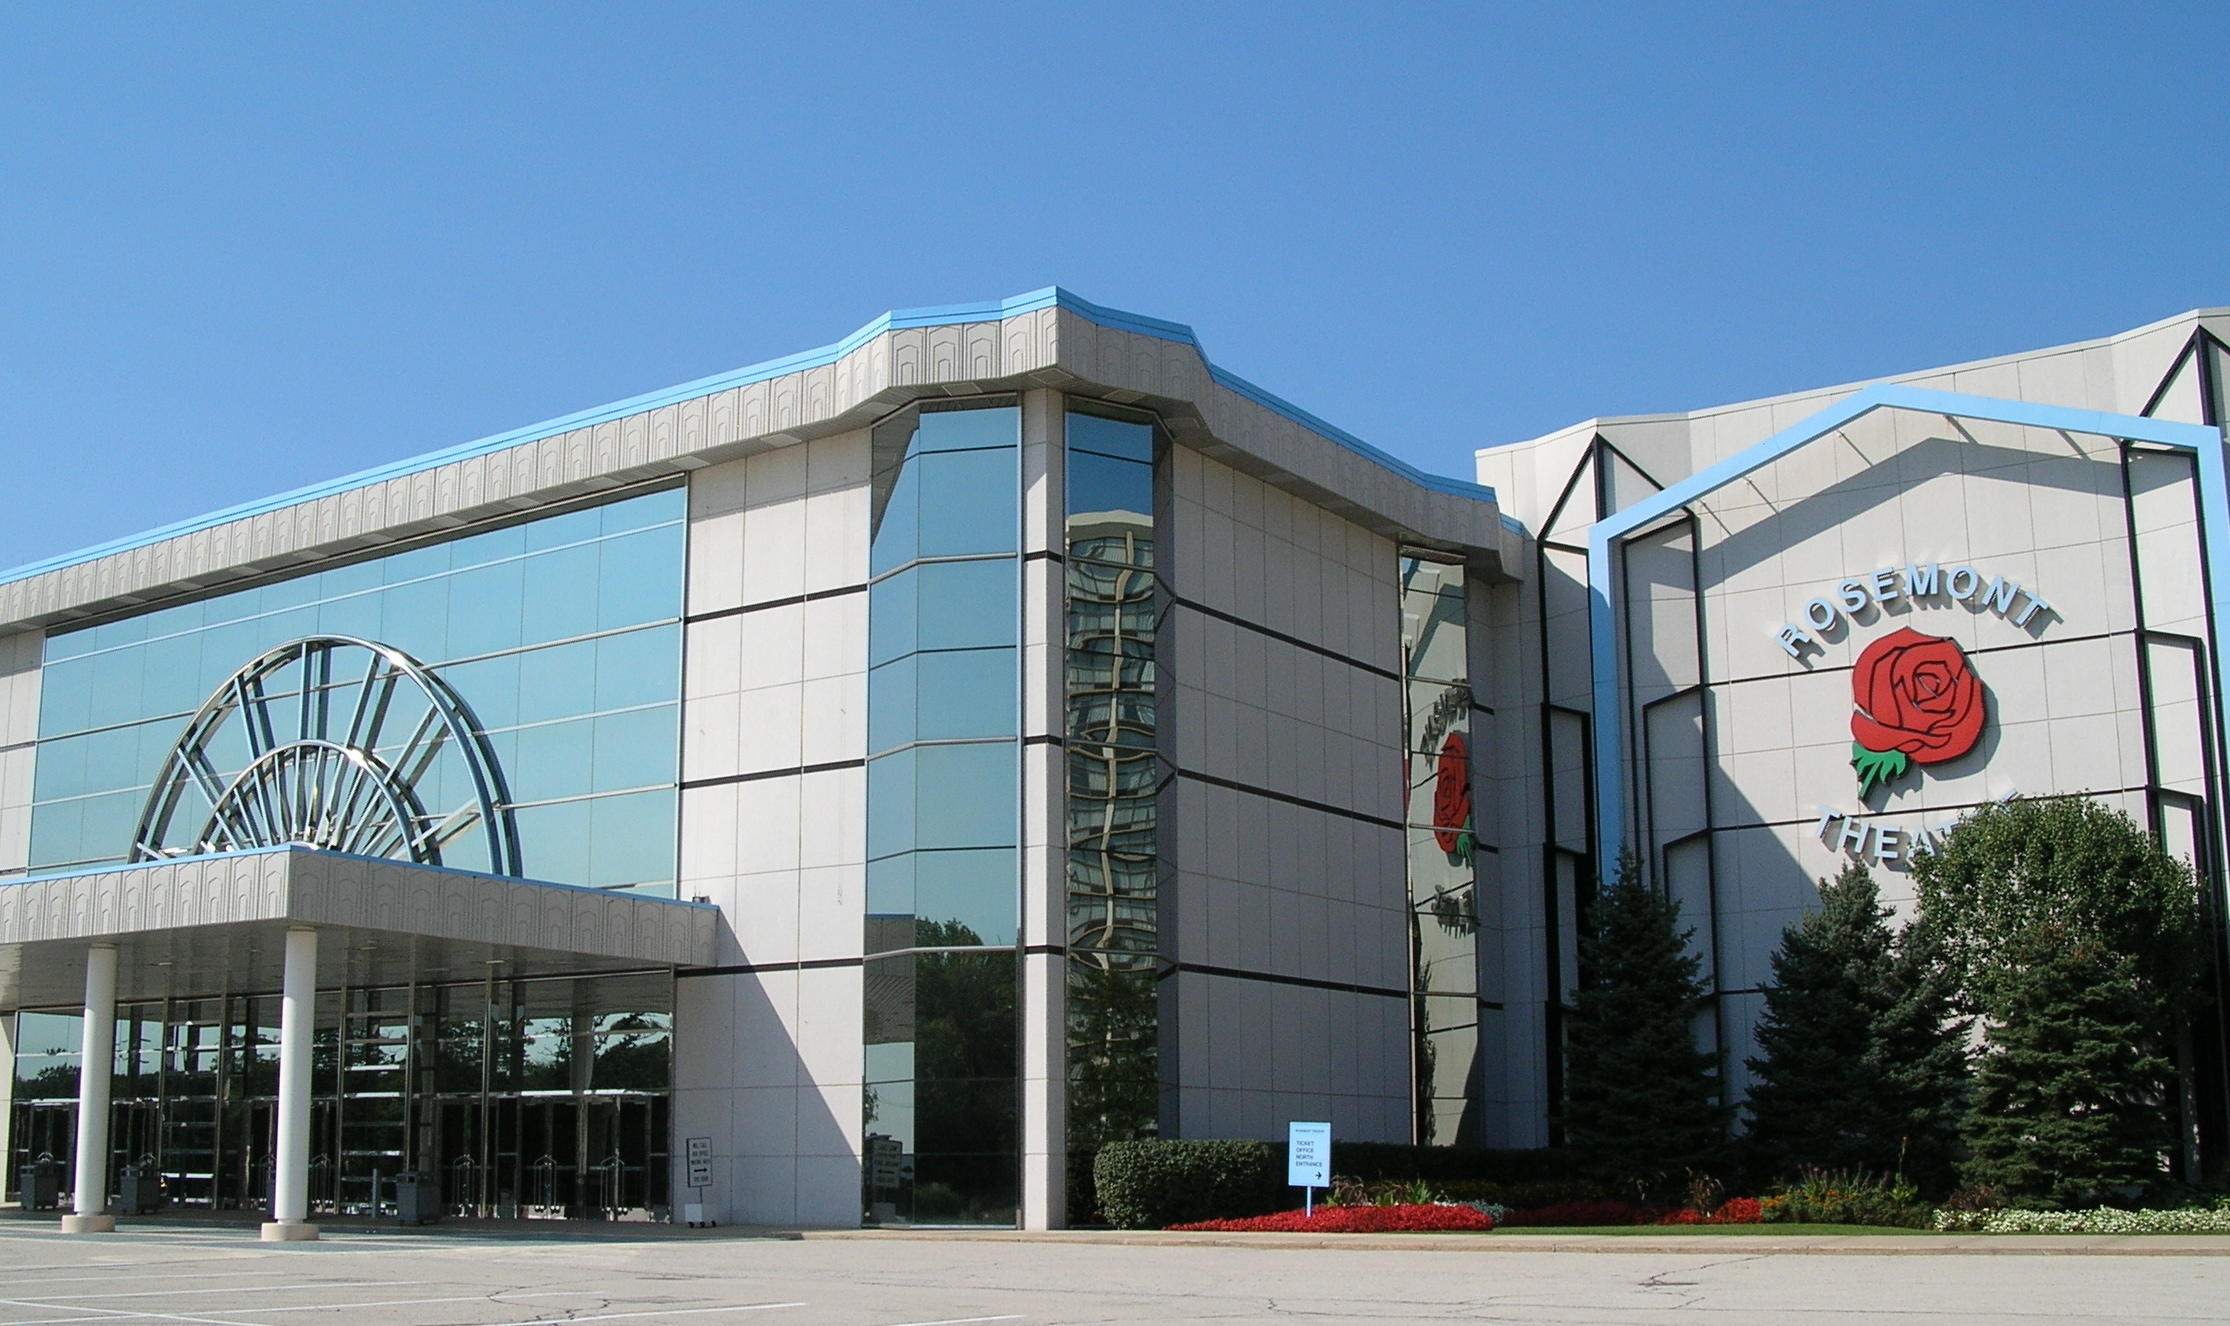 Rosemont Convention Bureau